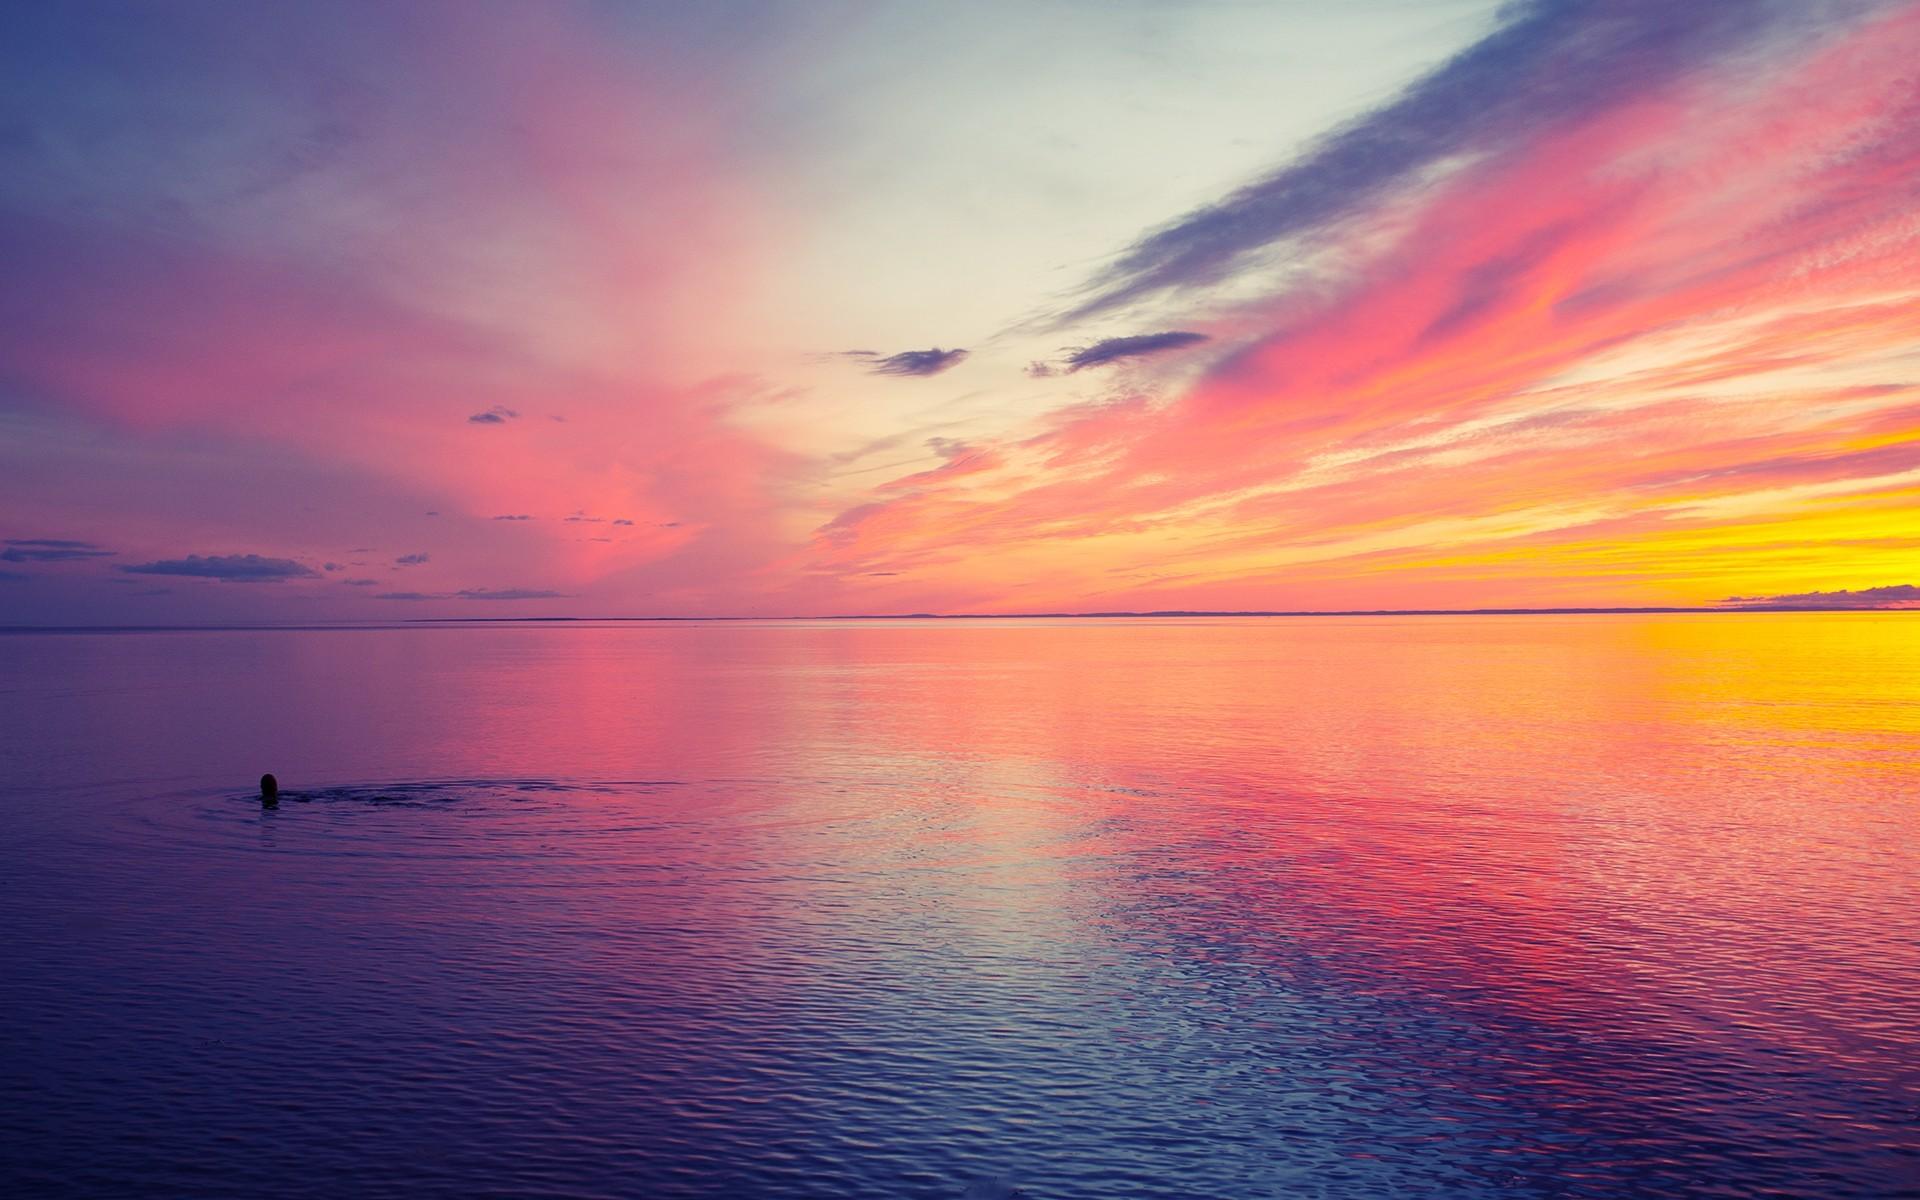 Beautiful Sunset at Sea wallpapers | Beautiful Sunset at Sea stock .